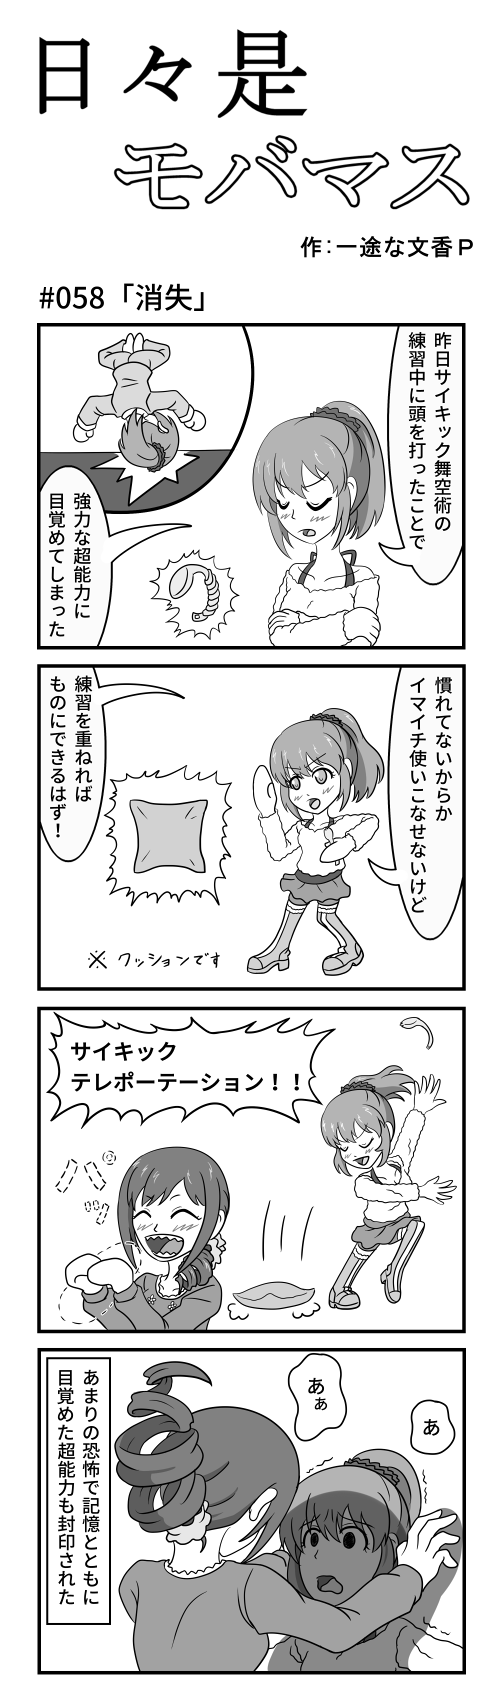 x2H4DKg (1)